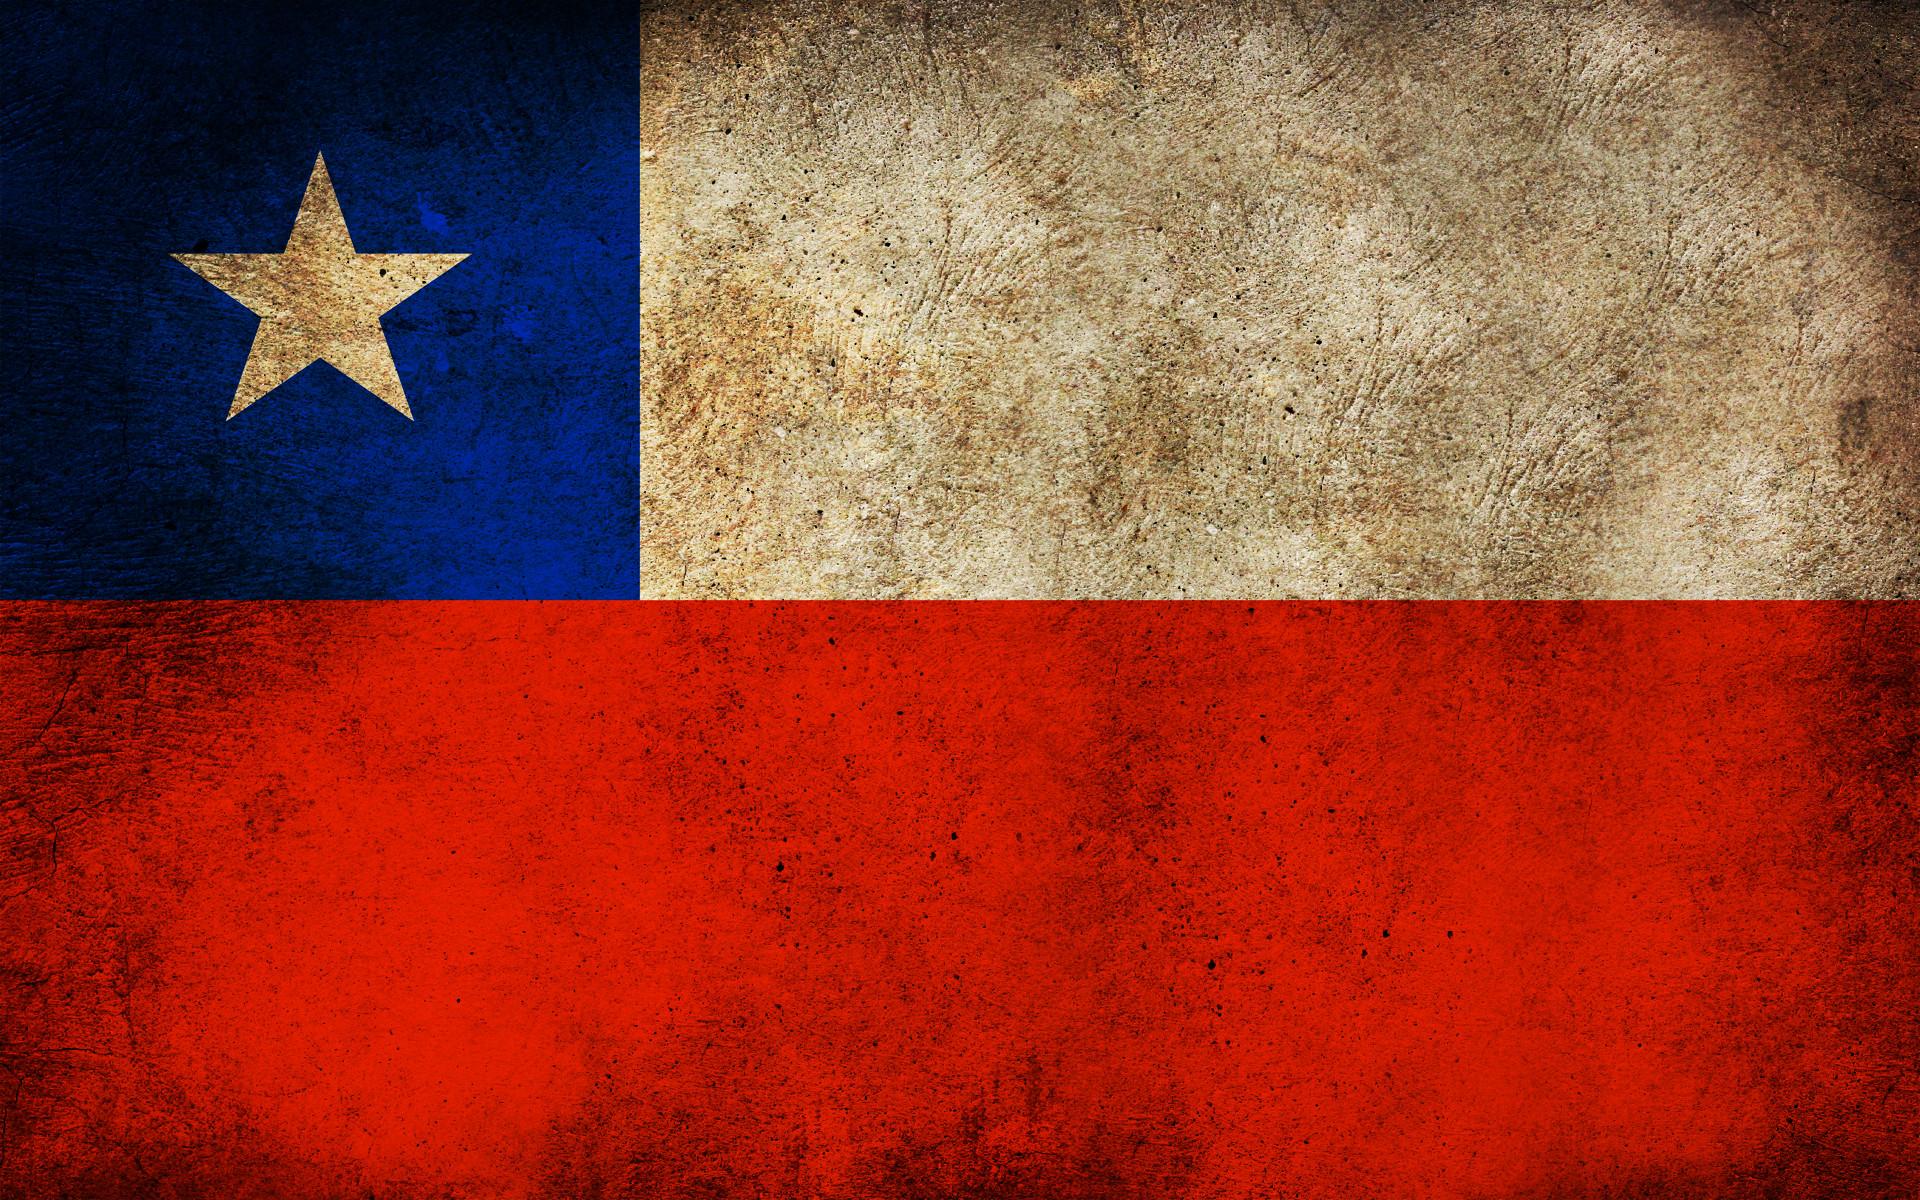 Texas flag wallpapers 43 images - Texas flag wallpaper ...